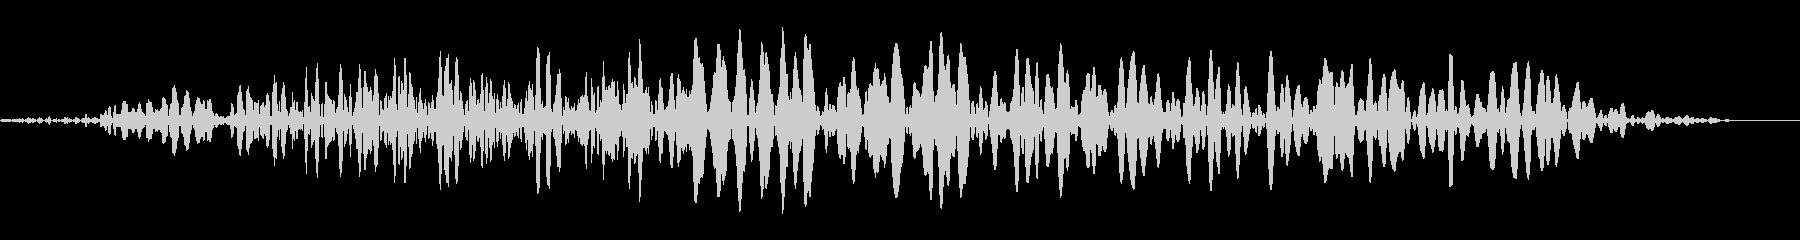 LC IMPフレーム14Cの未再生の波形